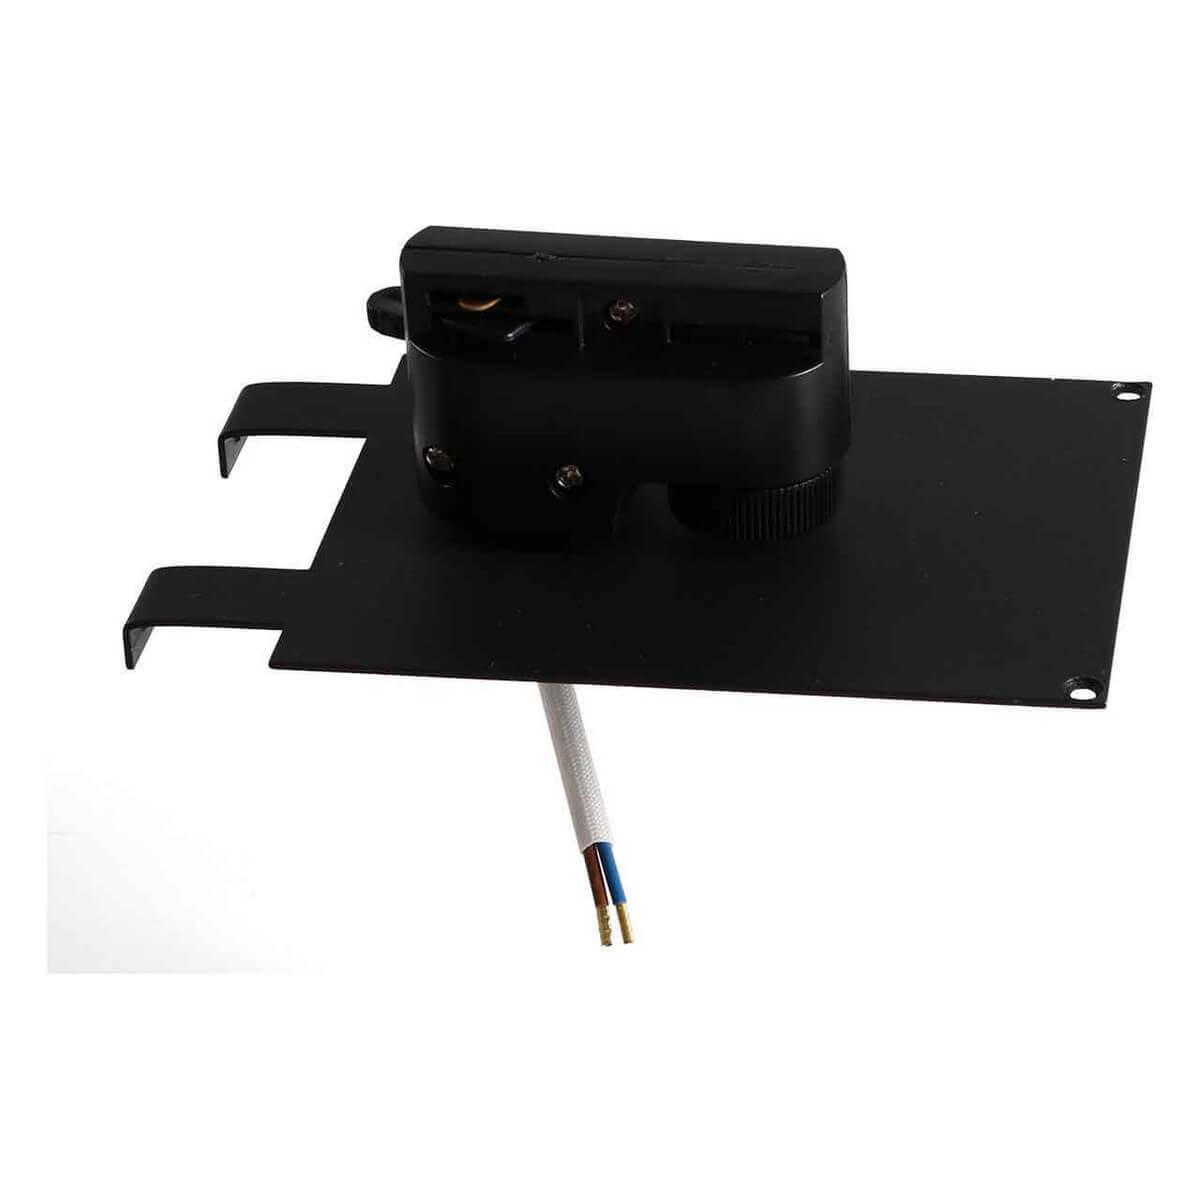 Адаптер для шинопровода Lightstar 592037 Asta Black (для однофазного шинопровода)